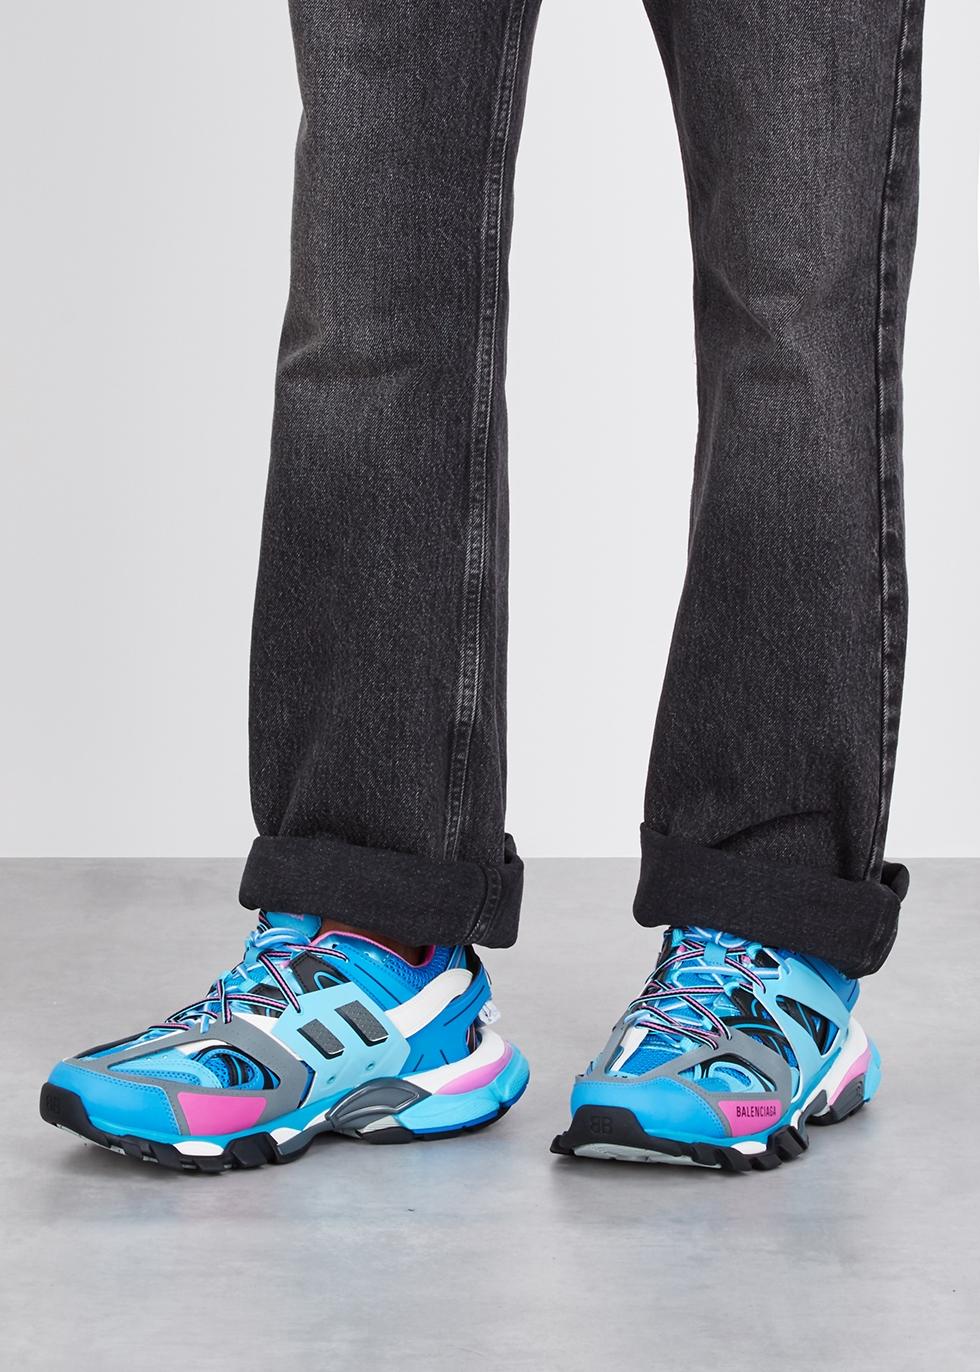 White Balenciaga Track Sneakers For Men Farfetch com